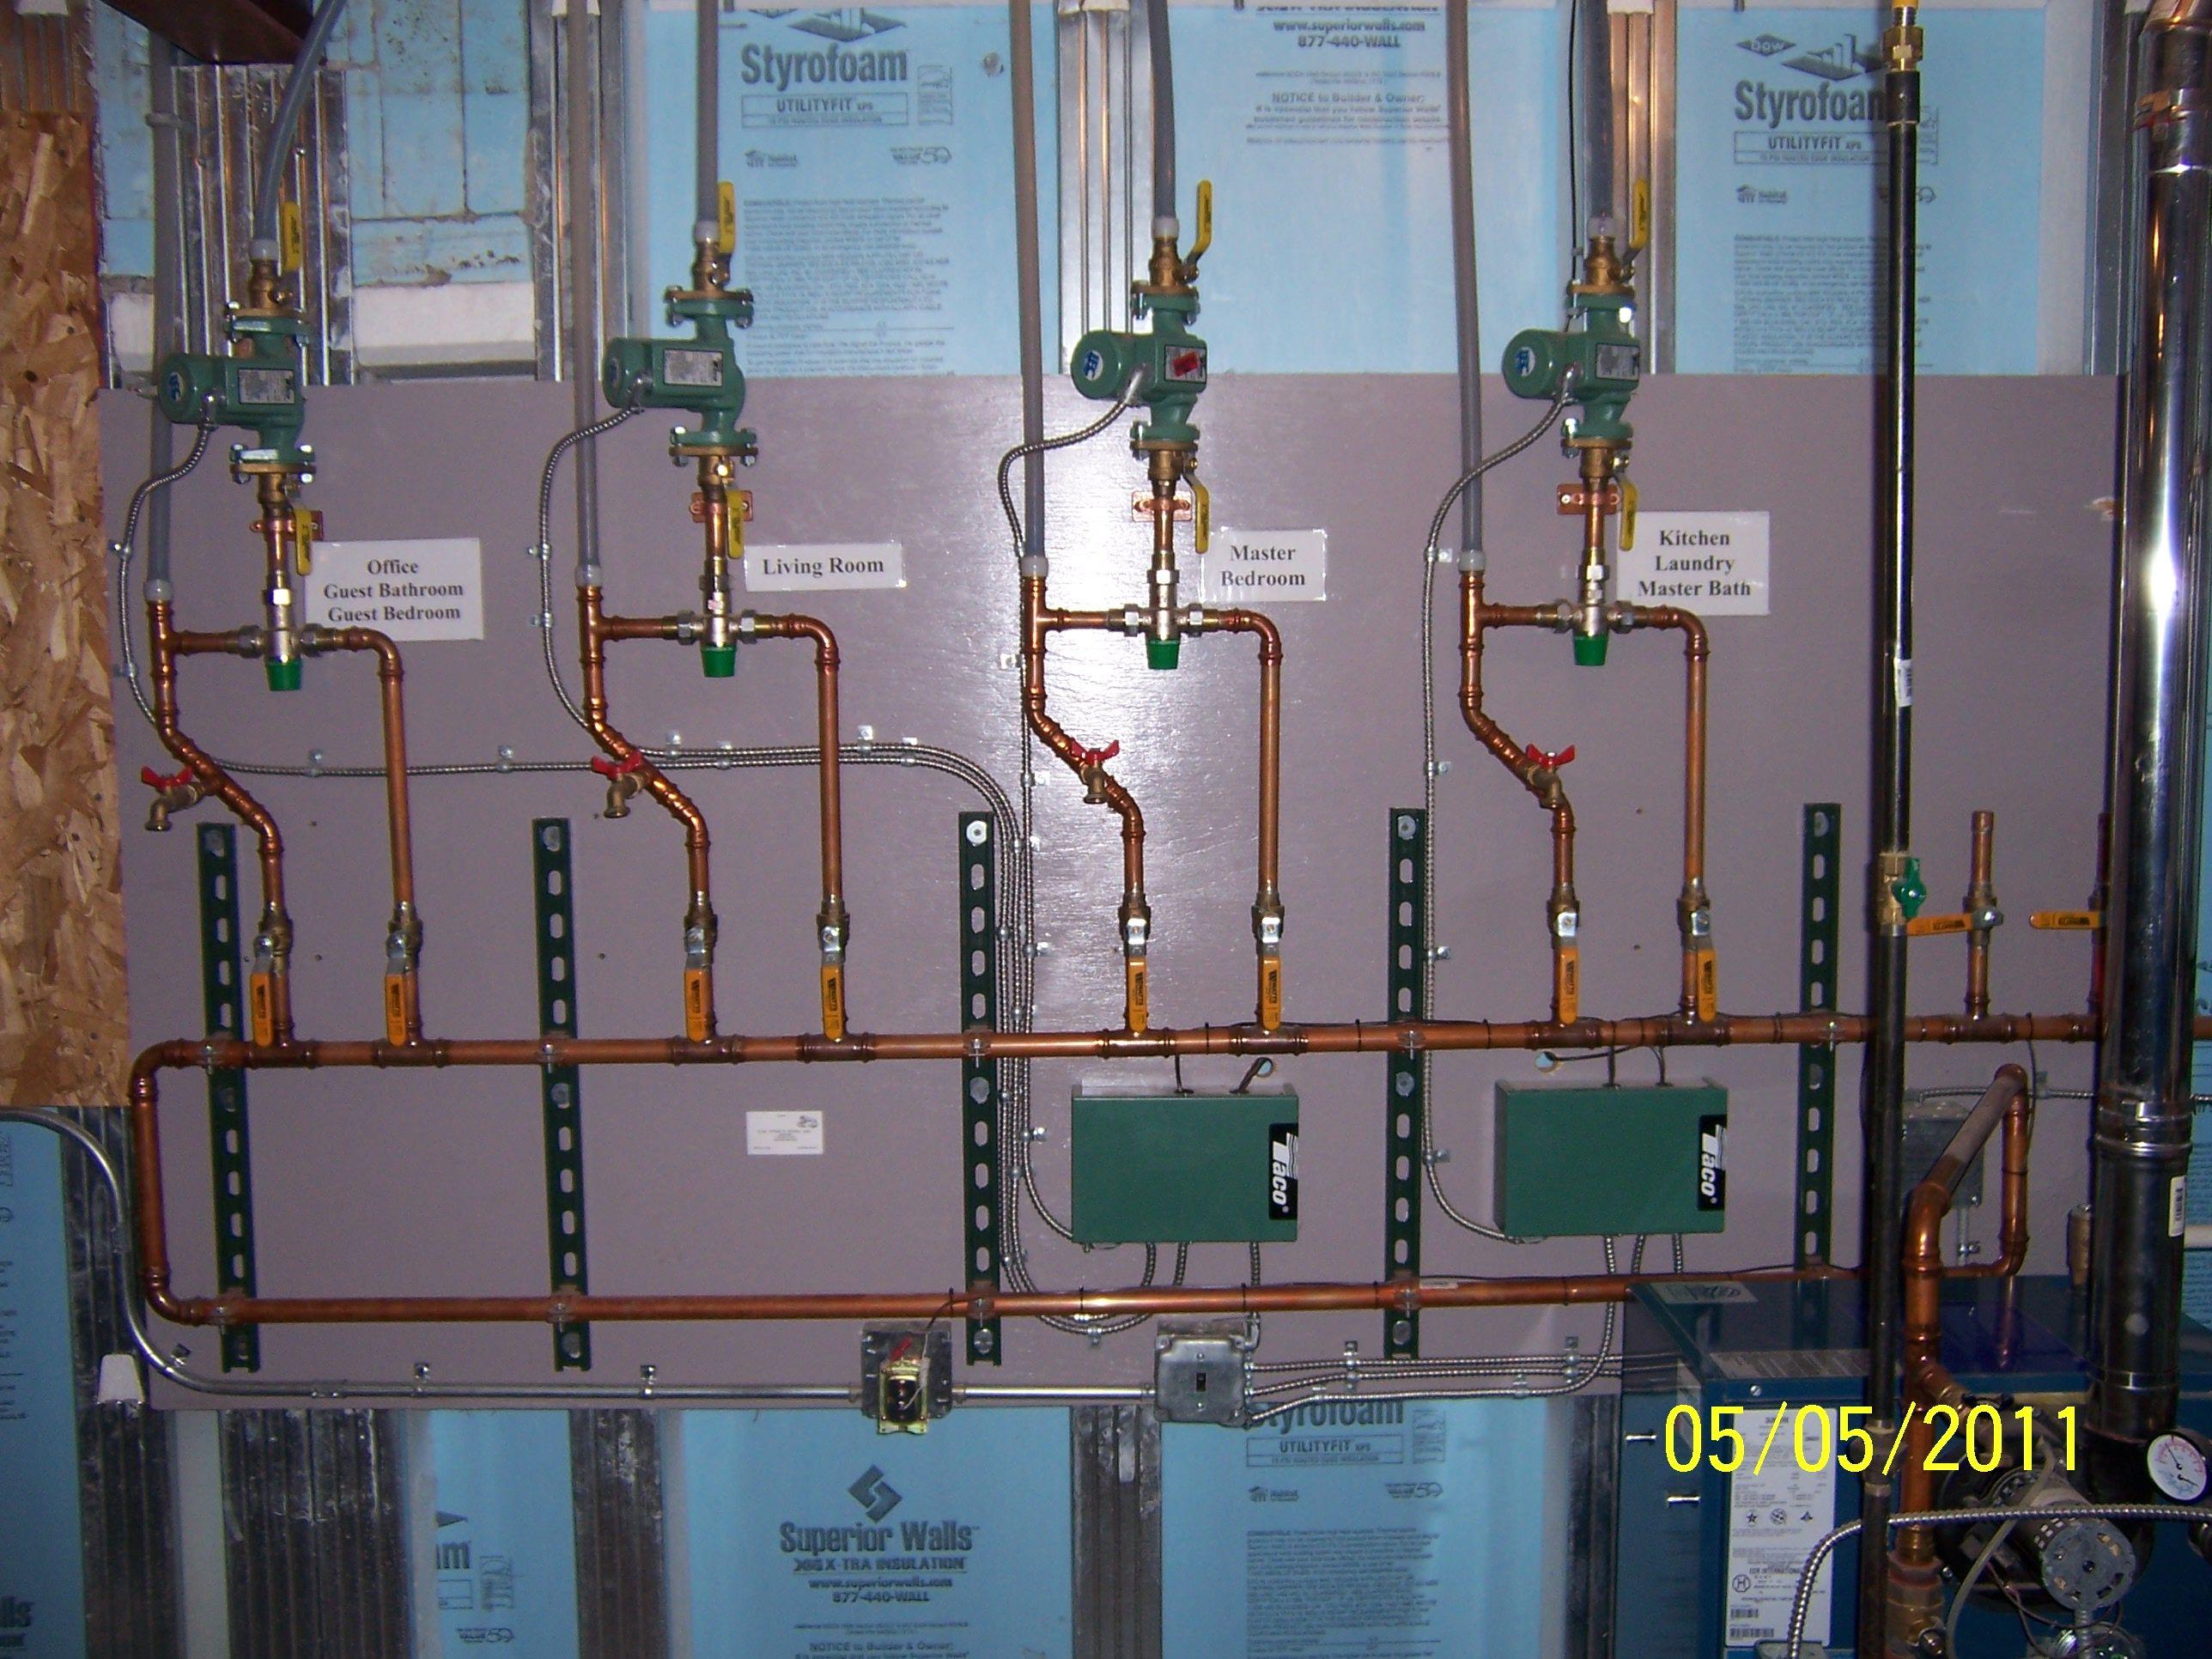 Taco Circulator Piping Diagram - taco zone valve wiring